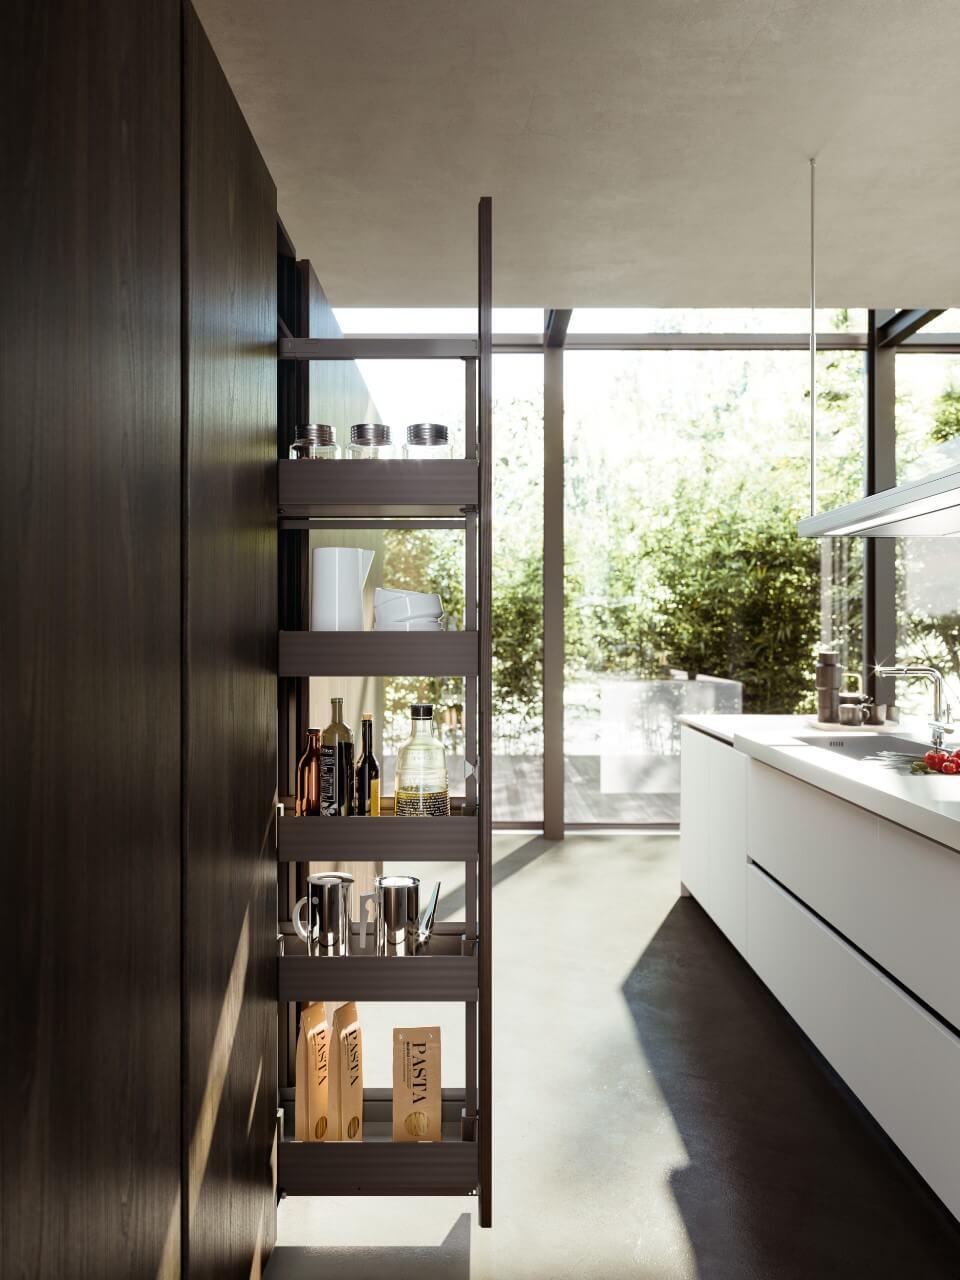 vybavenie kuchyne